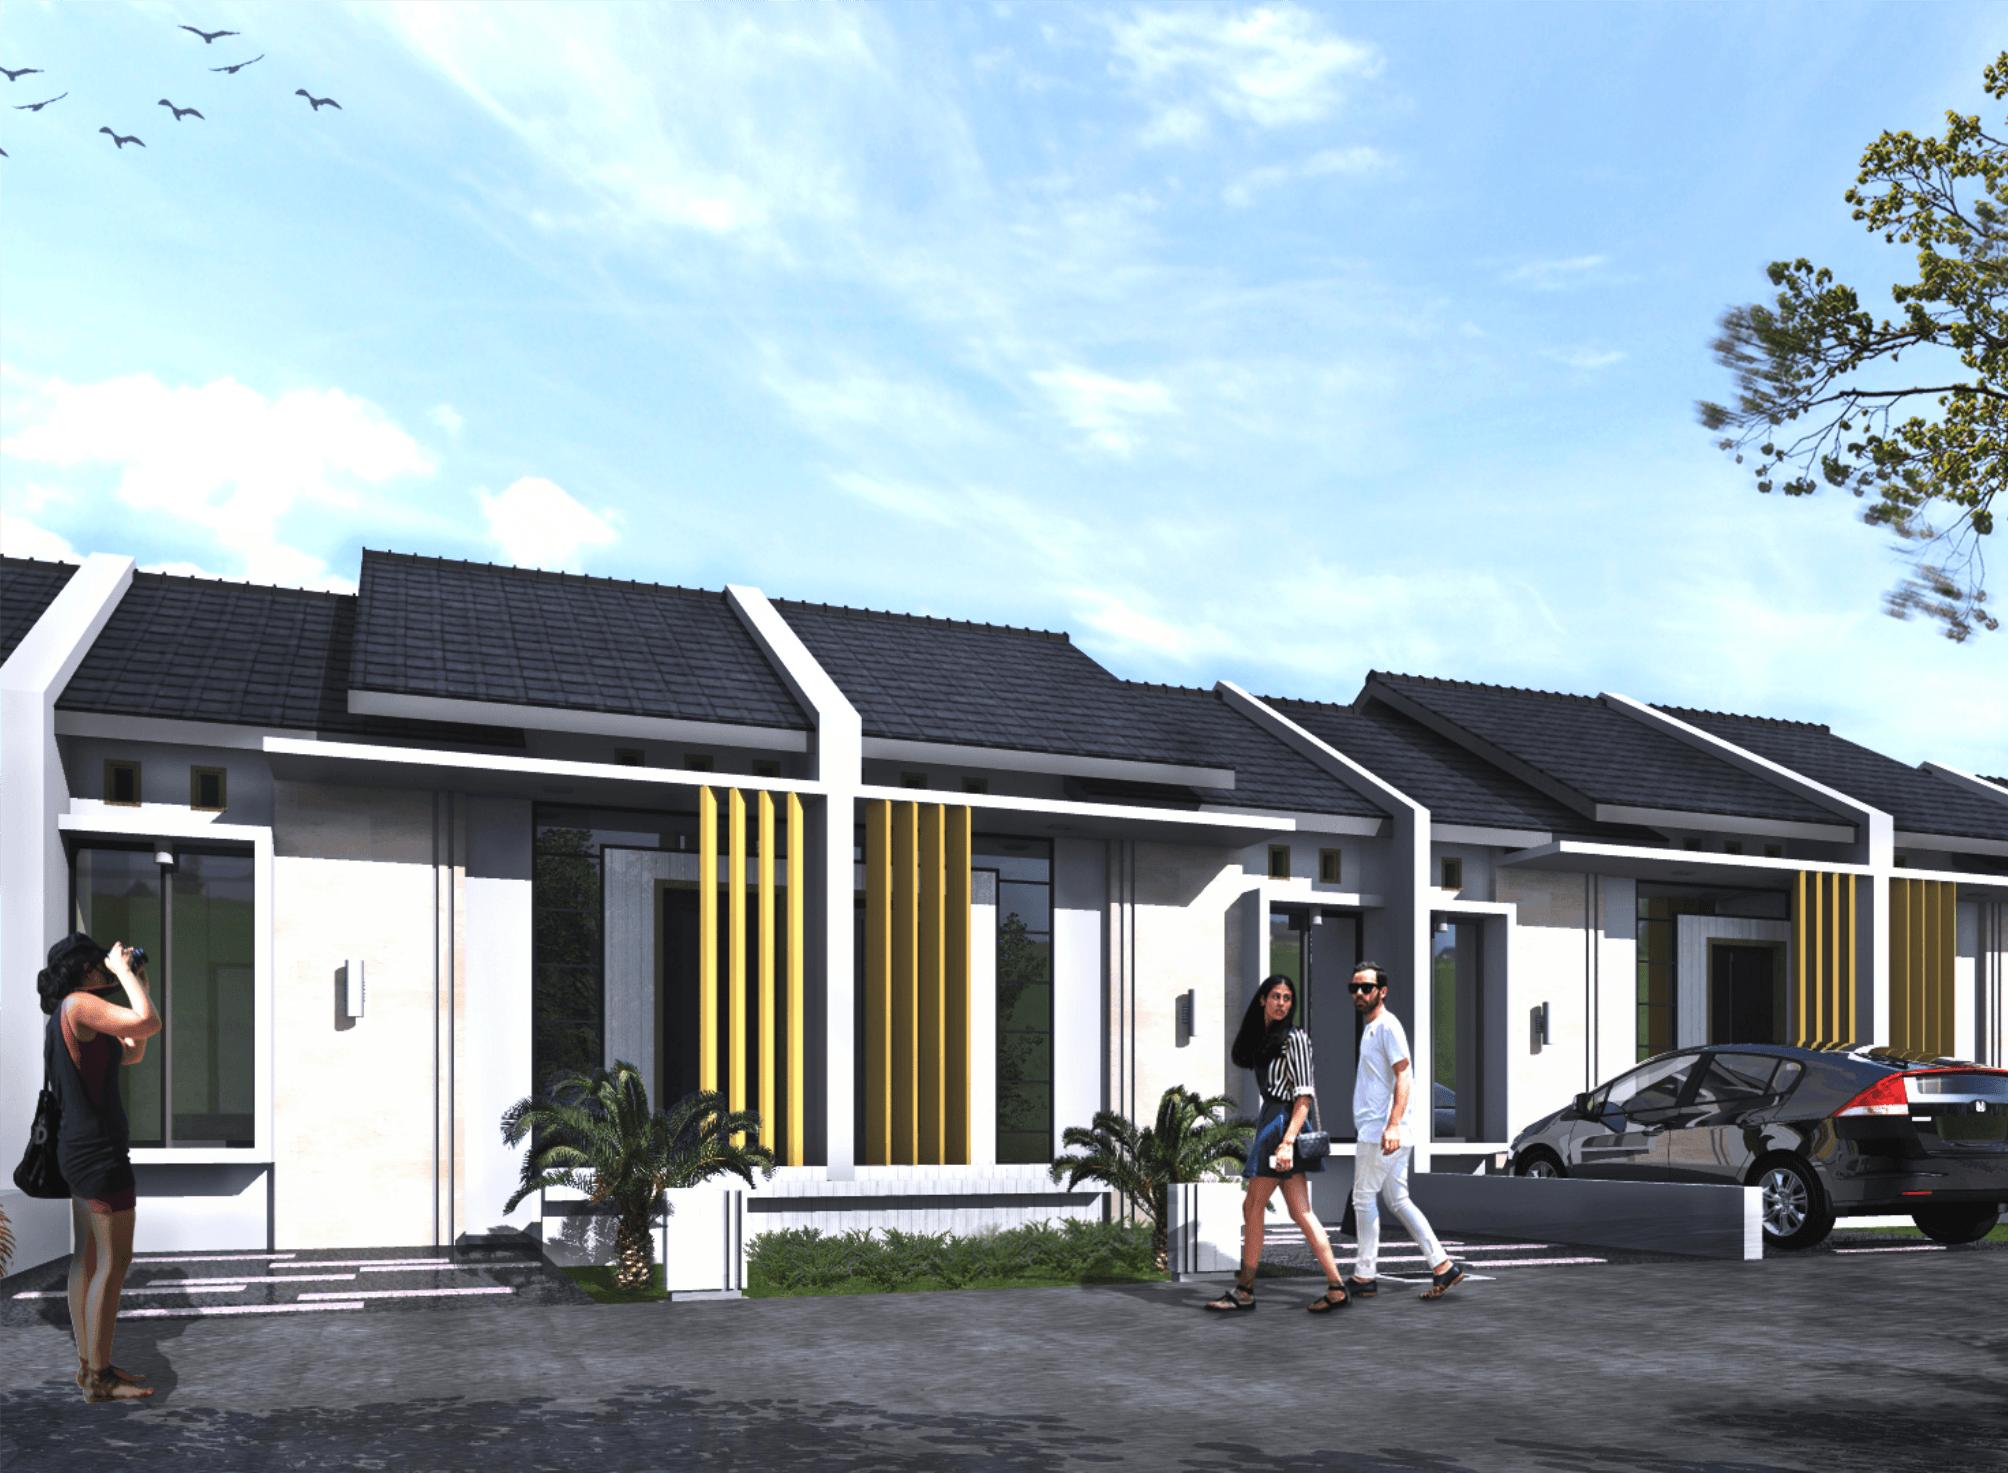 Atelier Baou Greenville Residential Kota Depok, Jawa Barat, Indonesia Kota Depok, Jawa Barat, Indonesia Atelier-Baou-Greenville-Residential   86426